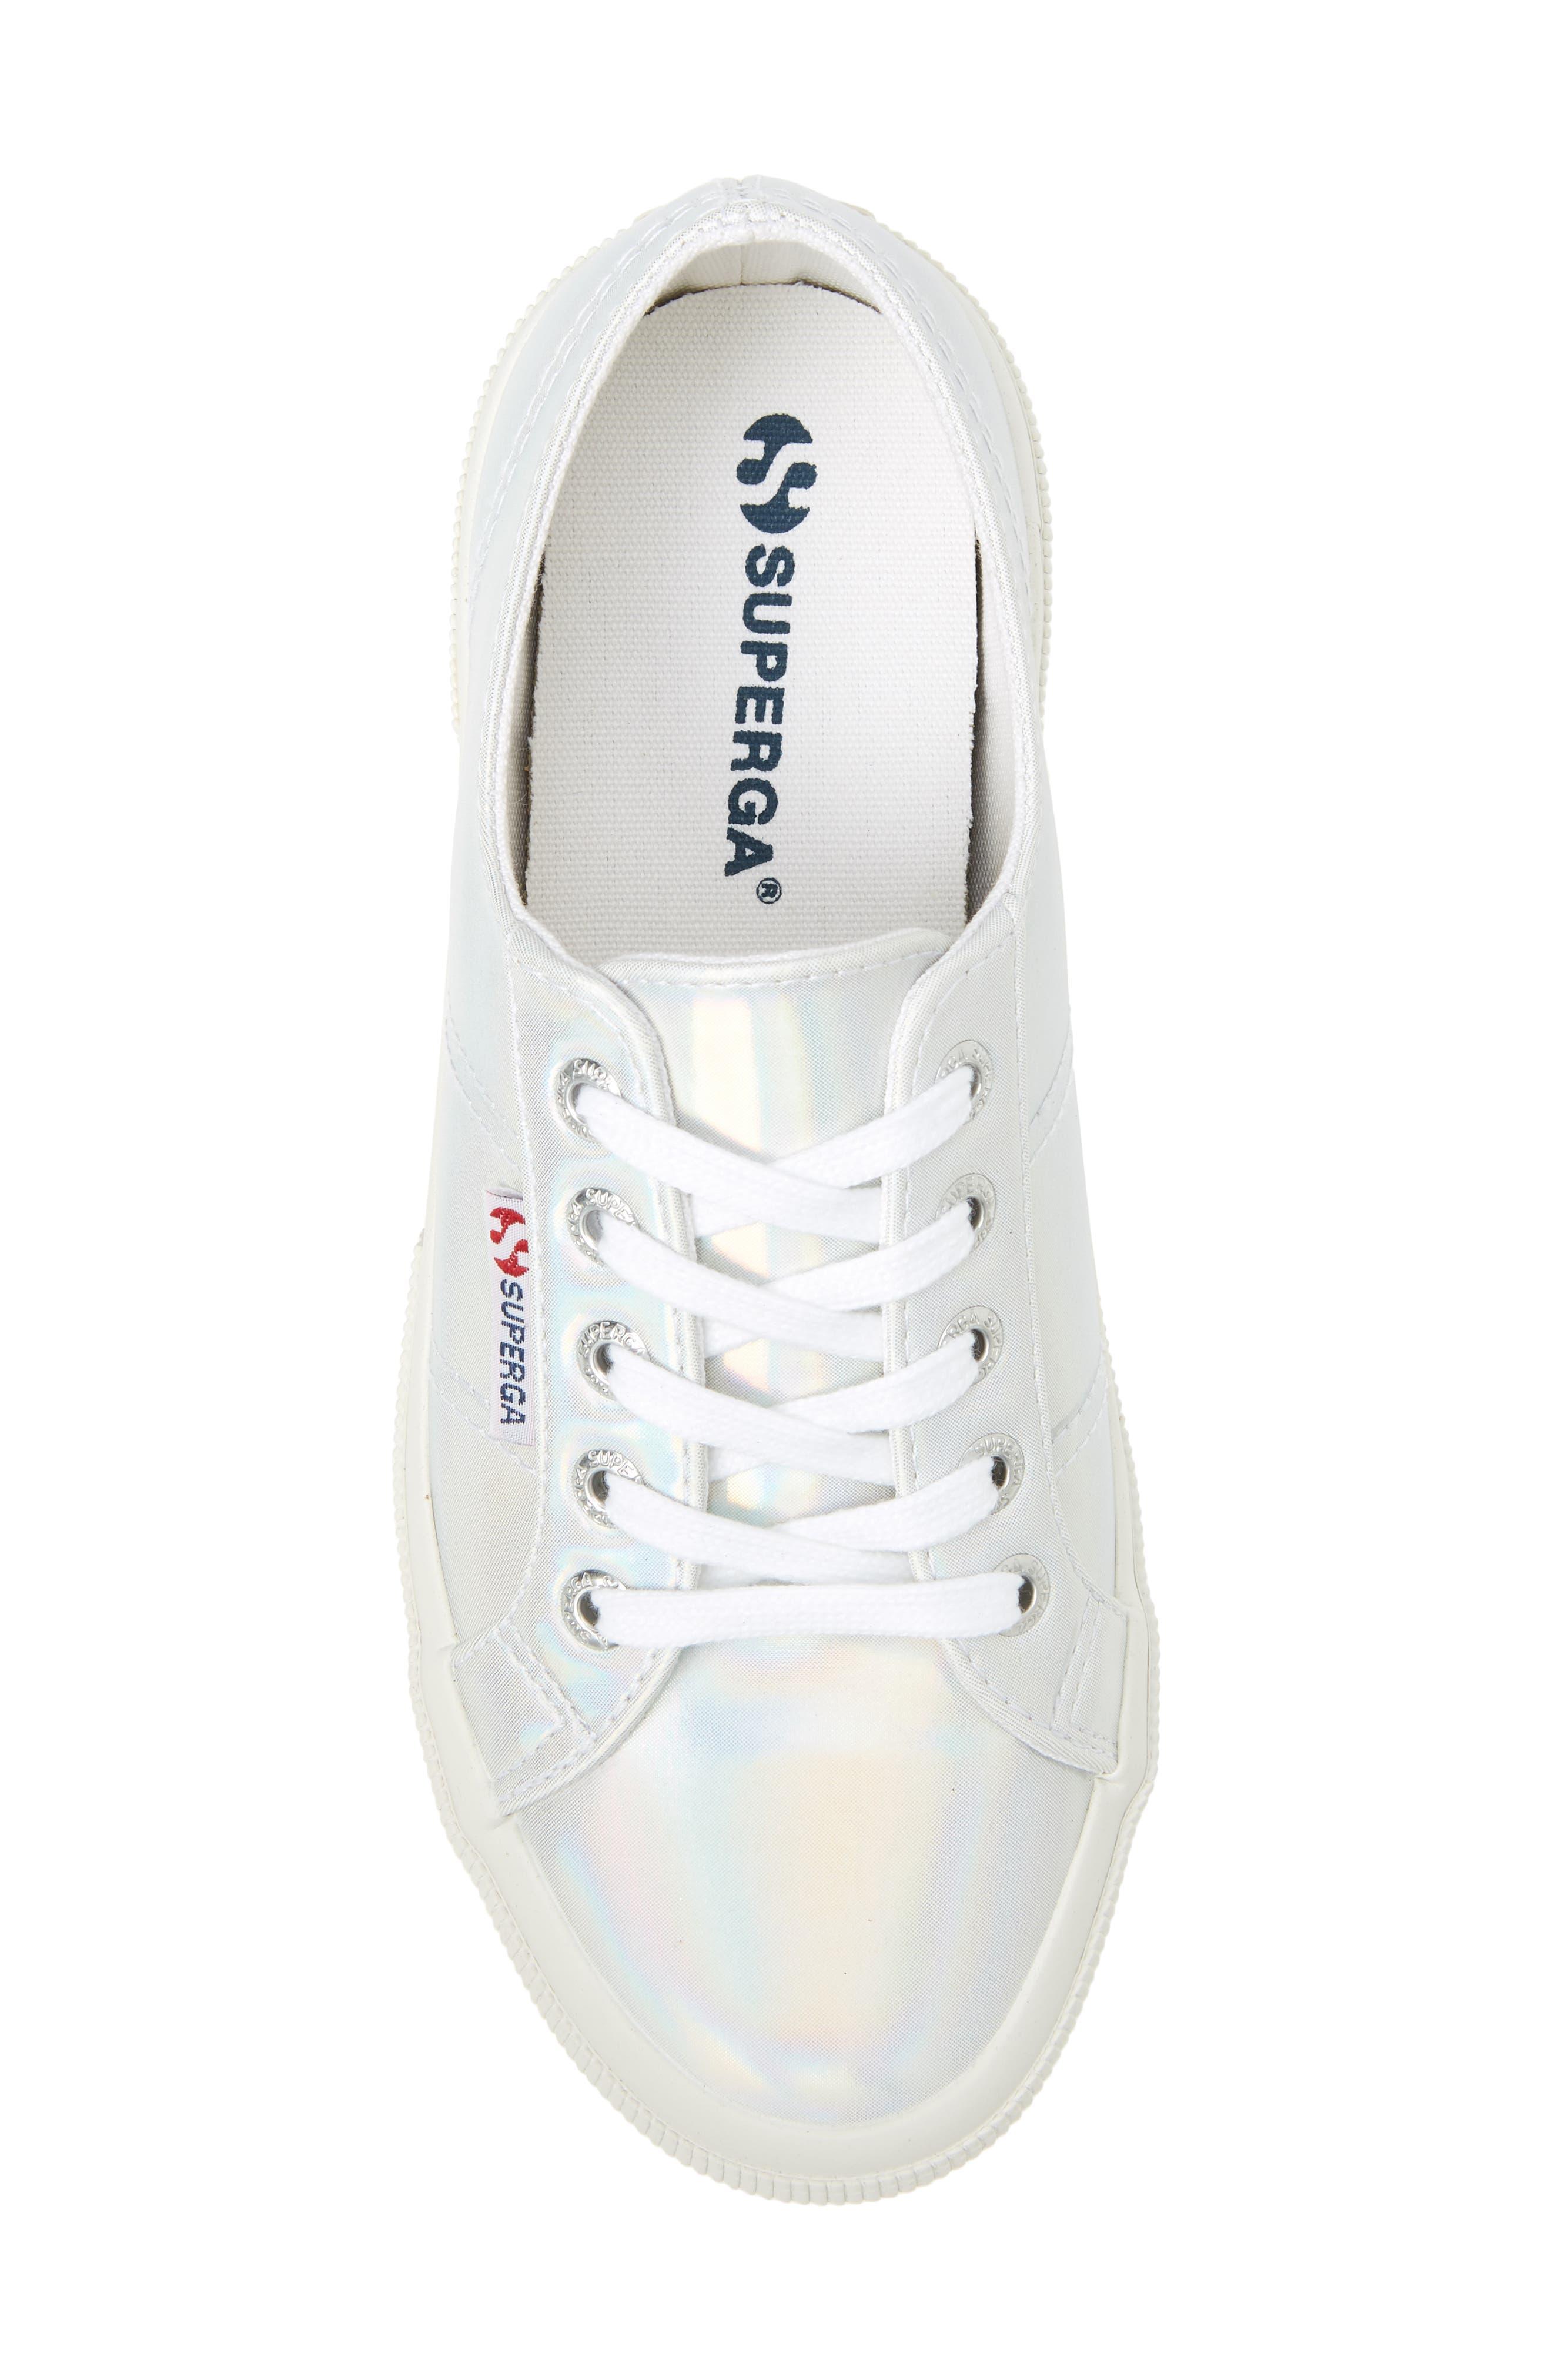 2750 Hologramw Low Top Sneaker,                             Alternate thumbnail 5, color,                             040